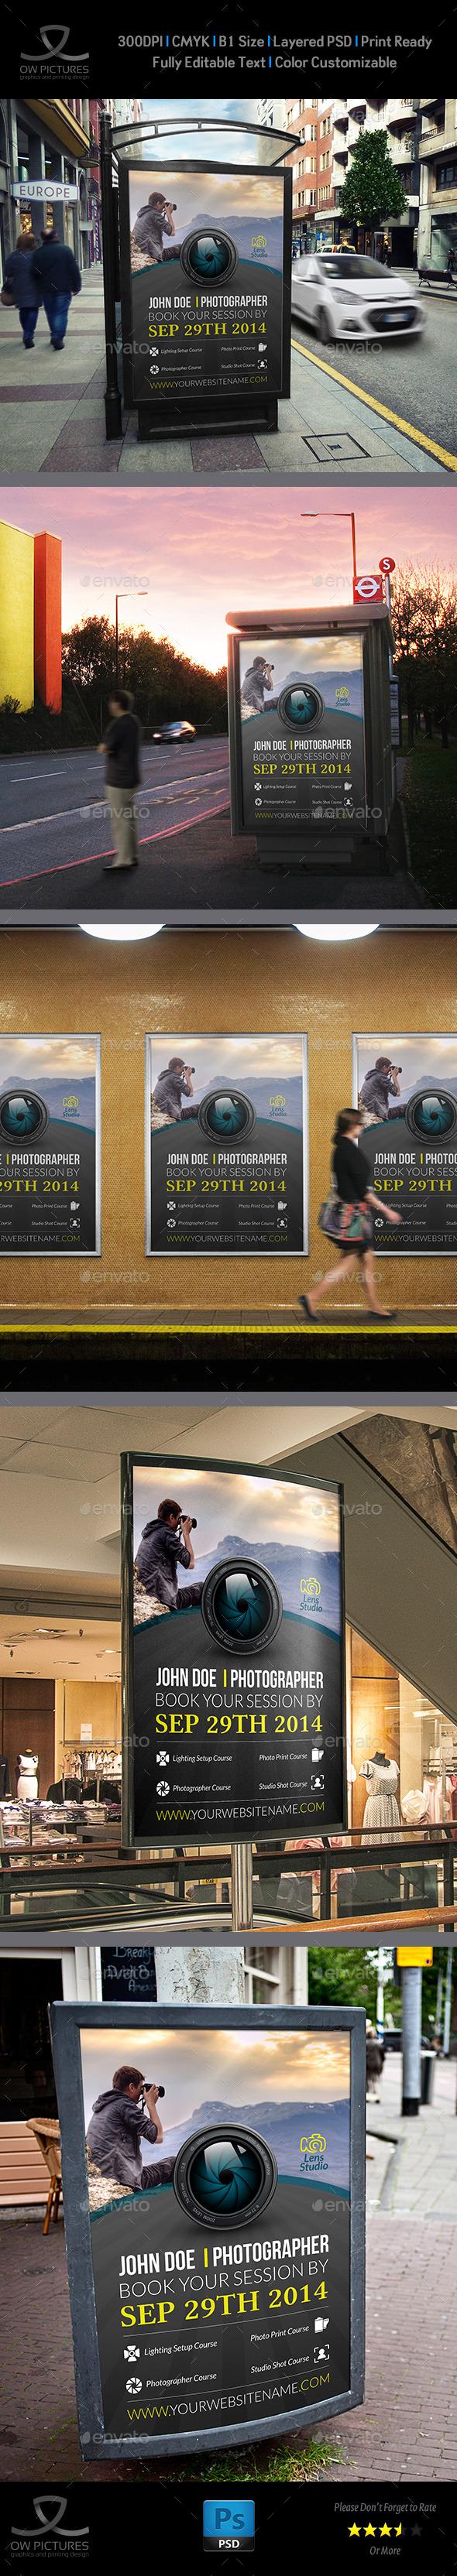 Photographer Poster Template - Signage Print Templates